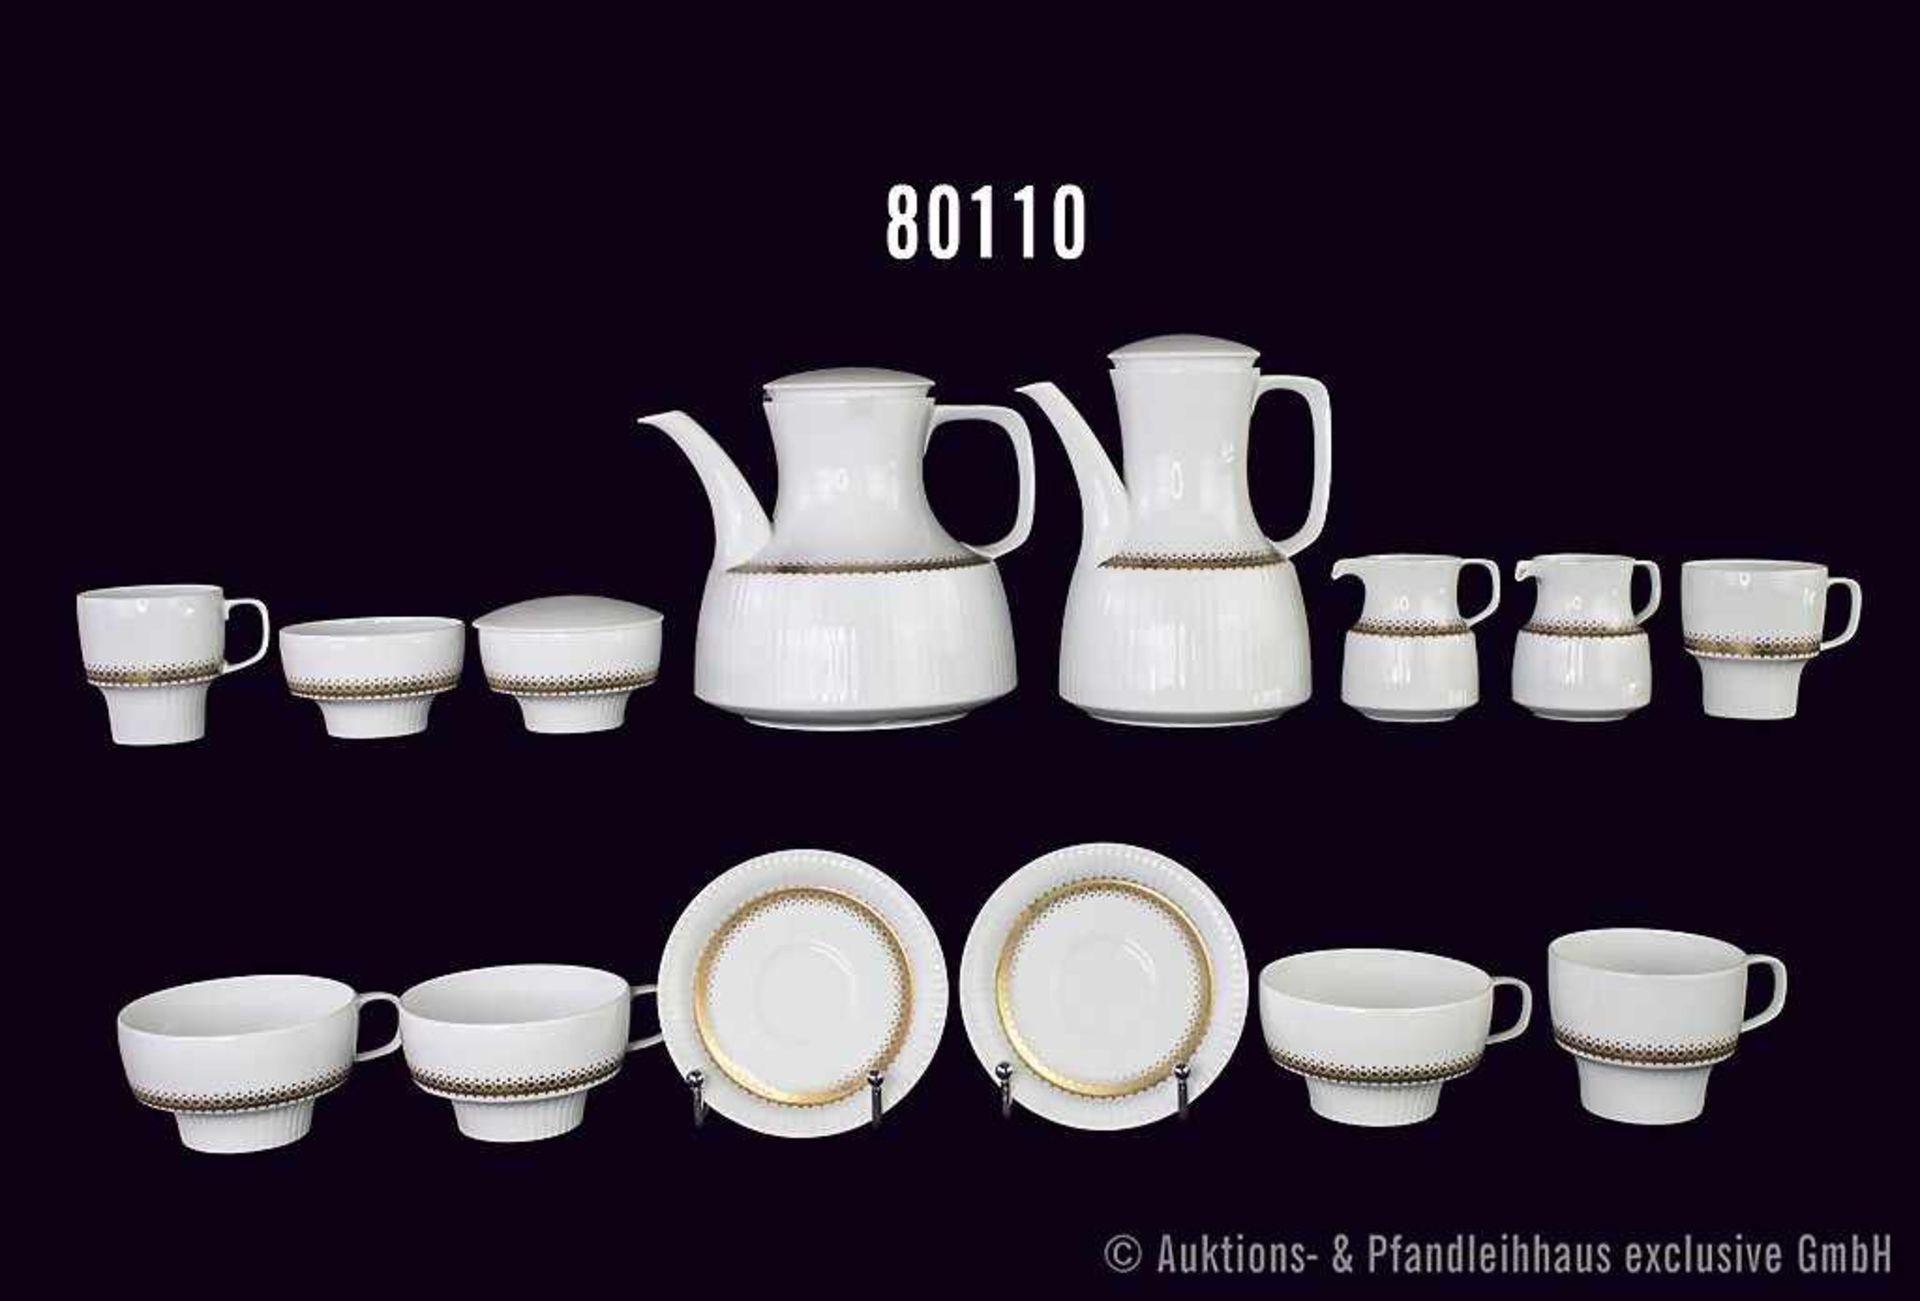 Konv. 14 Teile Rosenthal Porzellan, Serie Modulation, Dekor Goldrondell, Künstler Tapio Wirkkala,